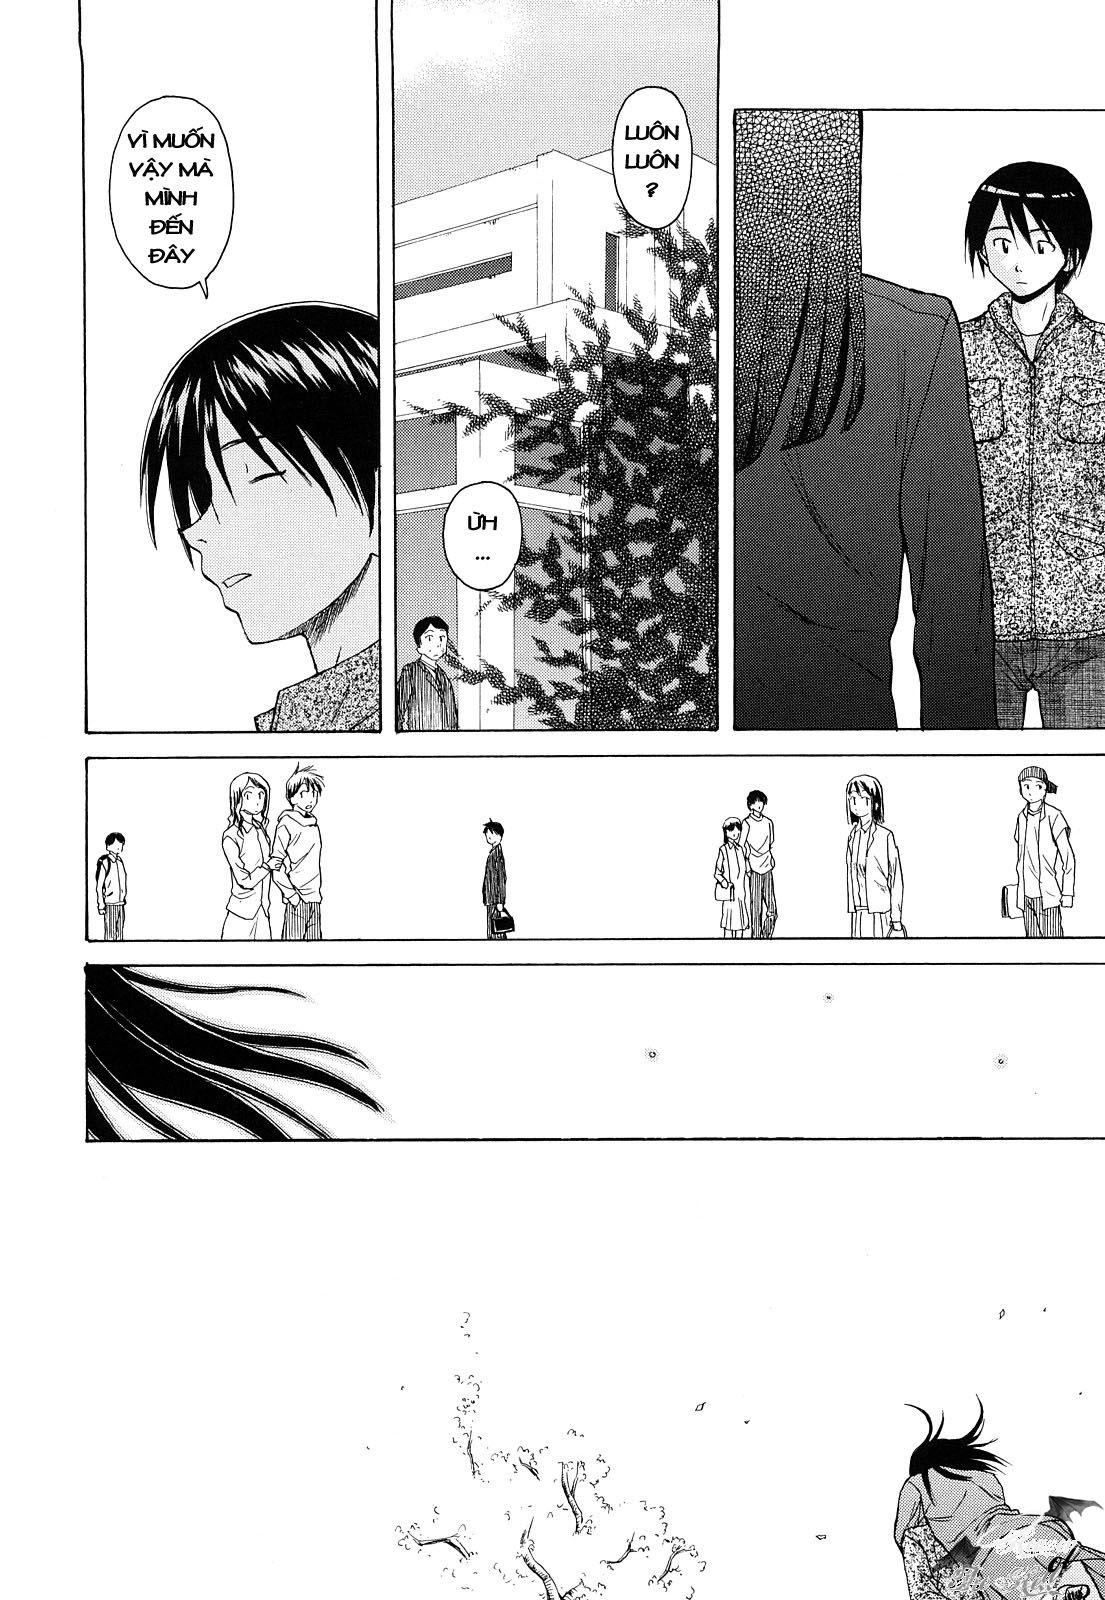 TruyenHay.Com - Ảnh 38 - Setsunai Omoi Chapter 4